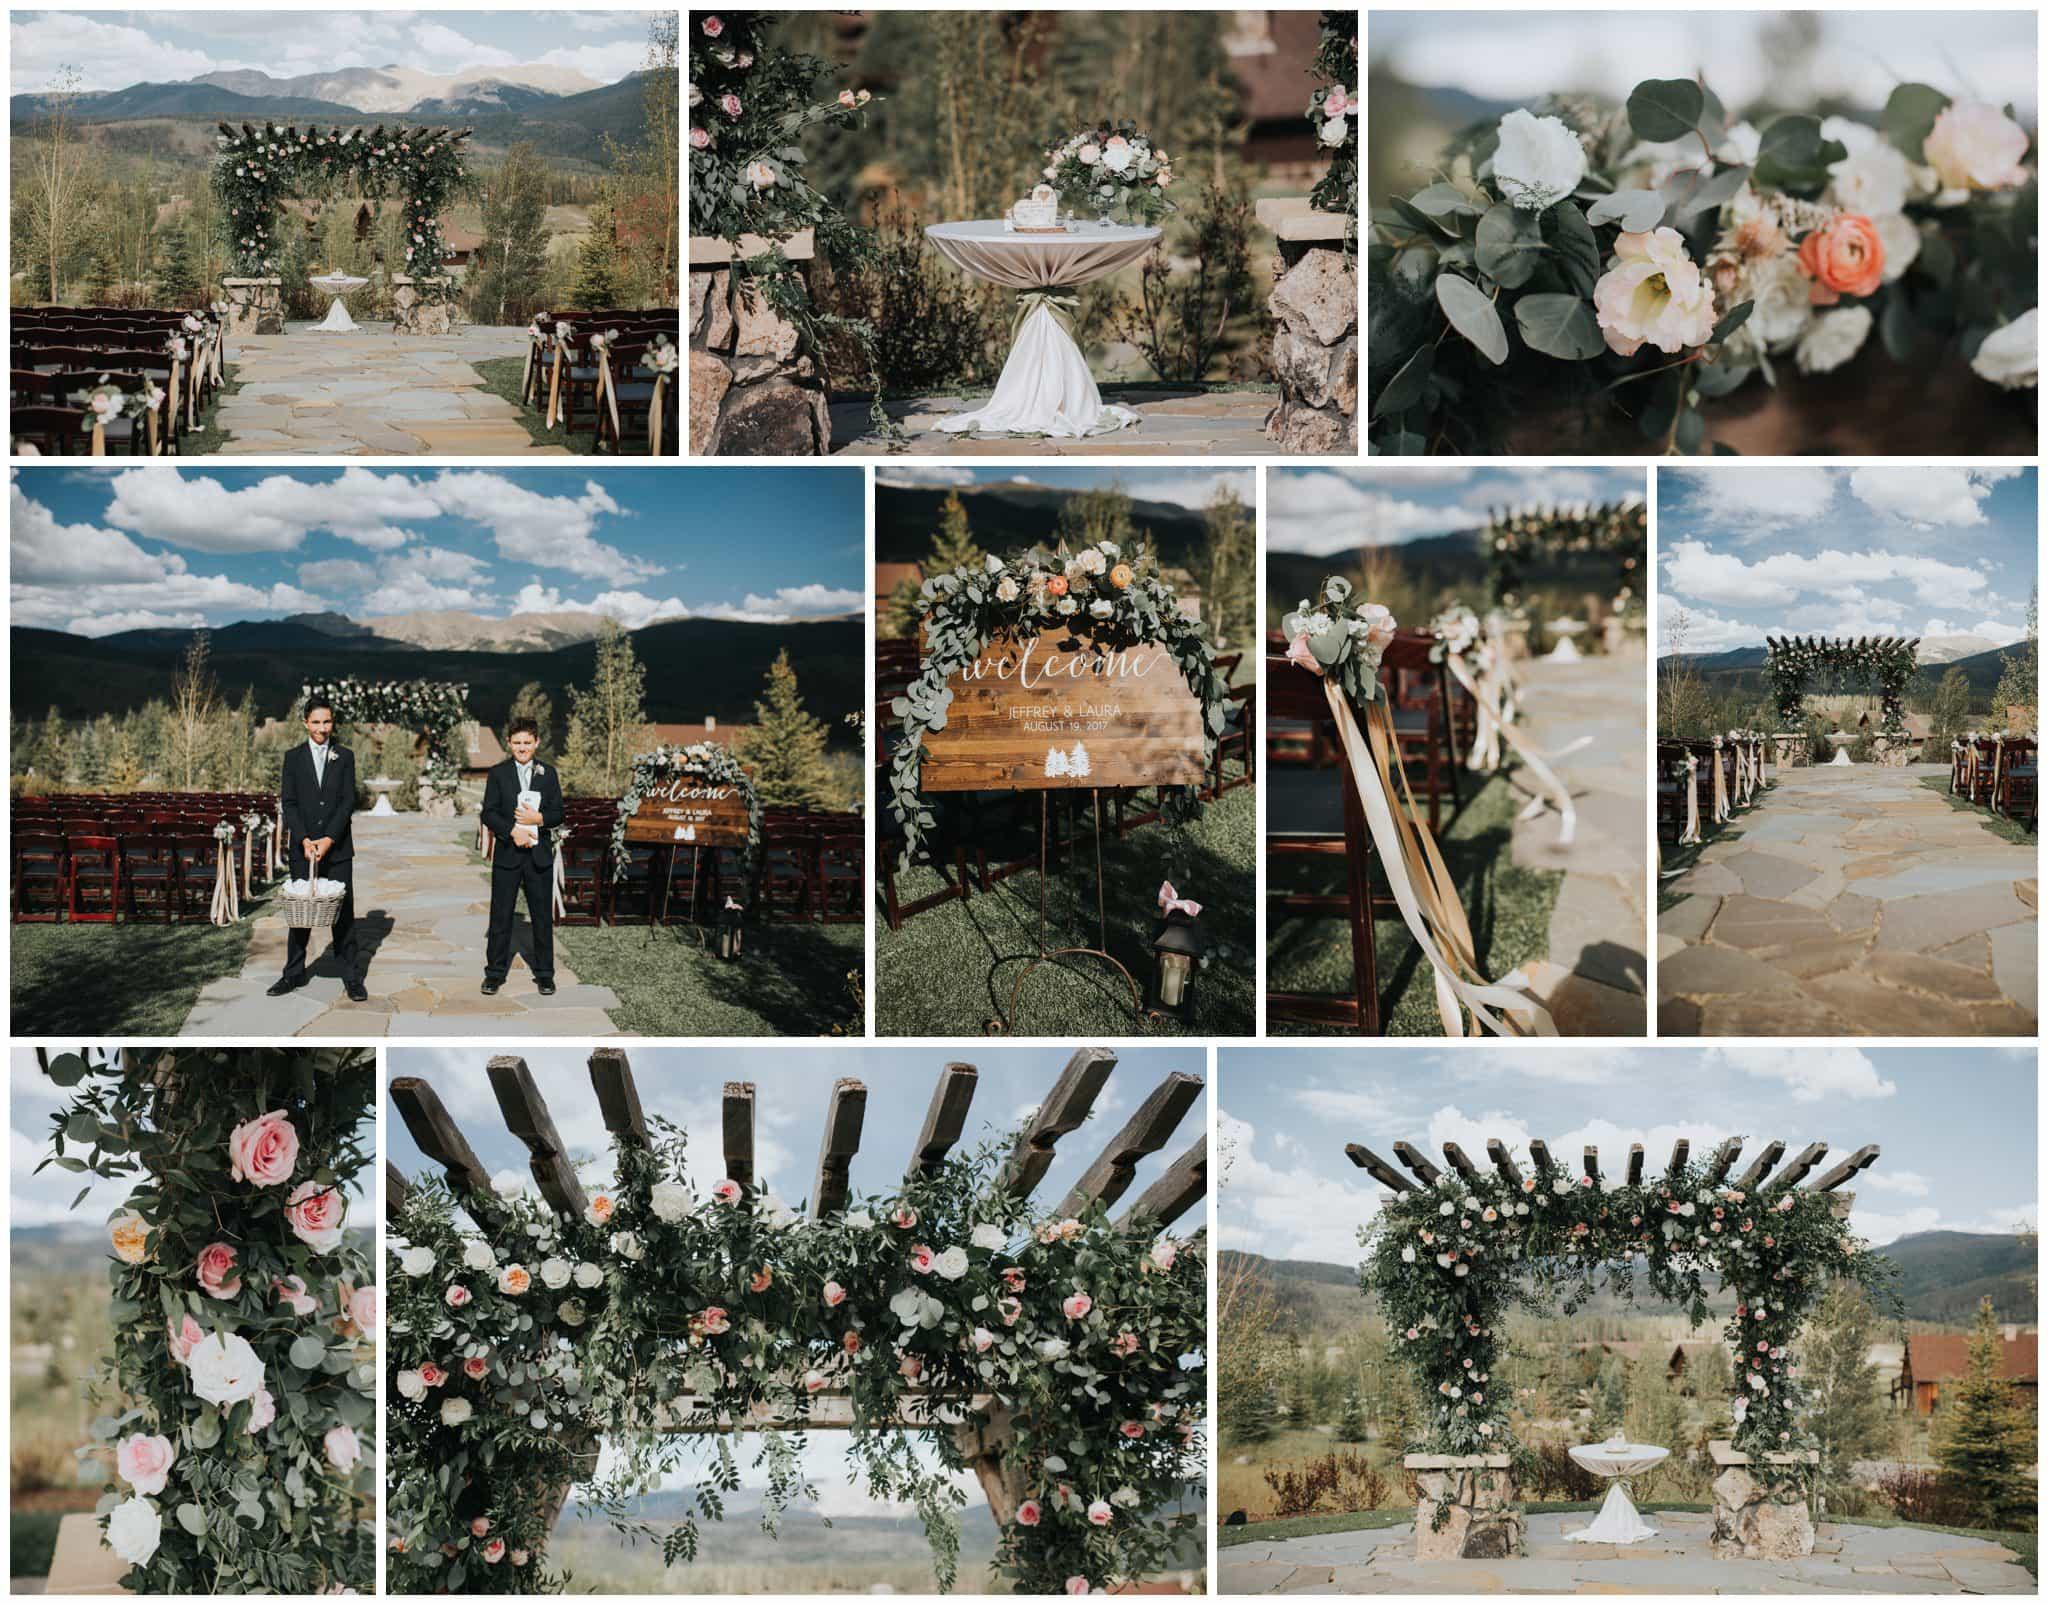 devils thumb ranch, devil's thumb ranch, ranch wedding, colorado ranch wedding, colorado barn wedding, colorado wedding photographer, rustic wedding